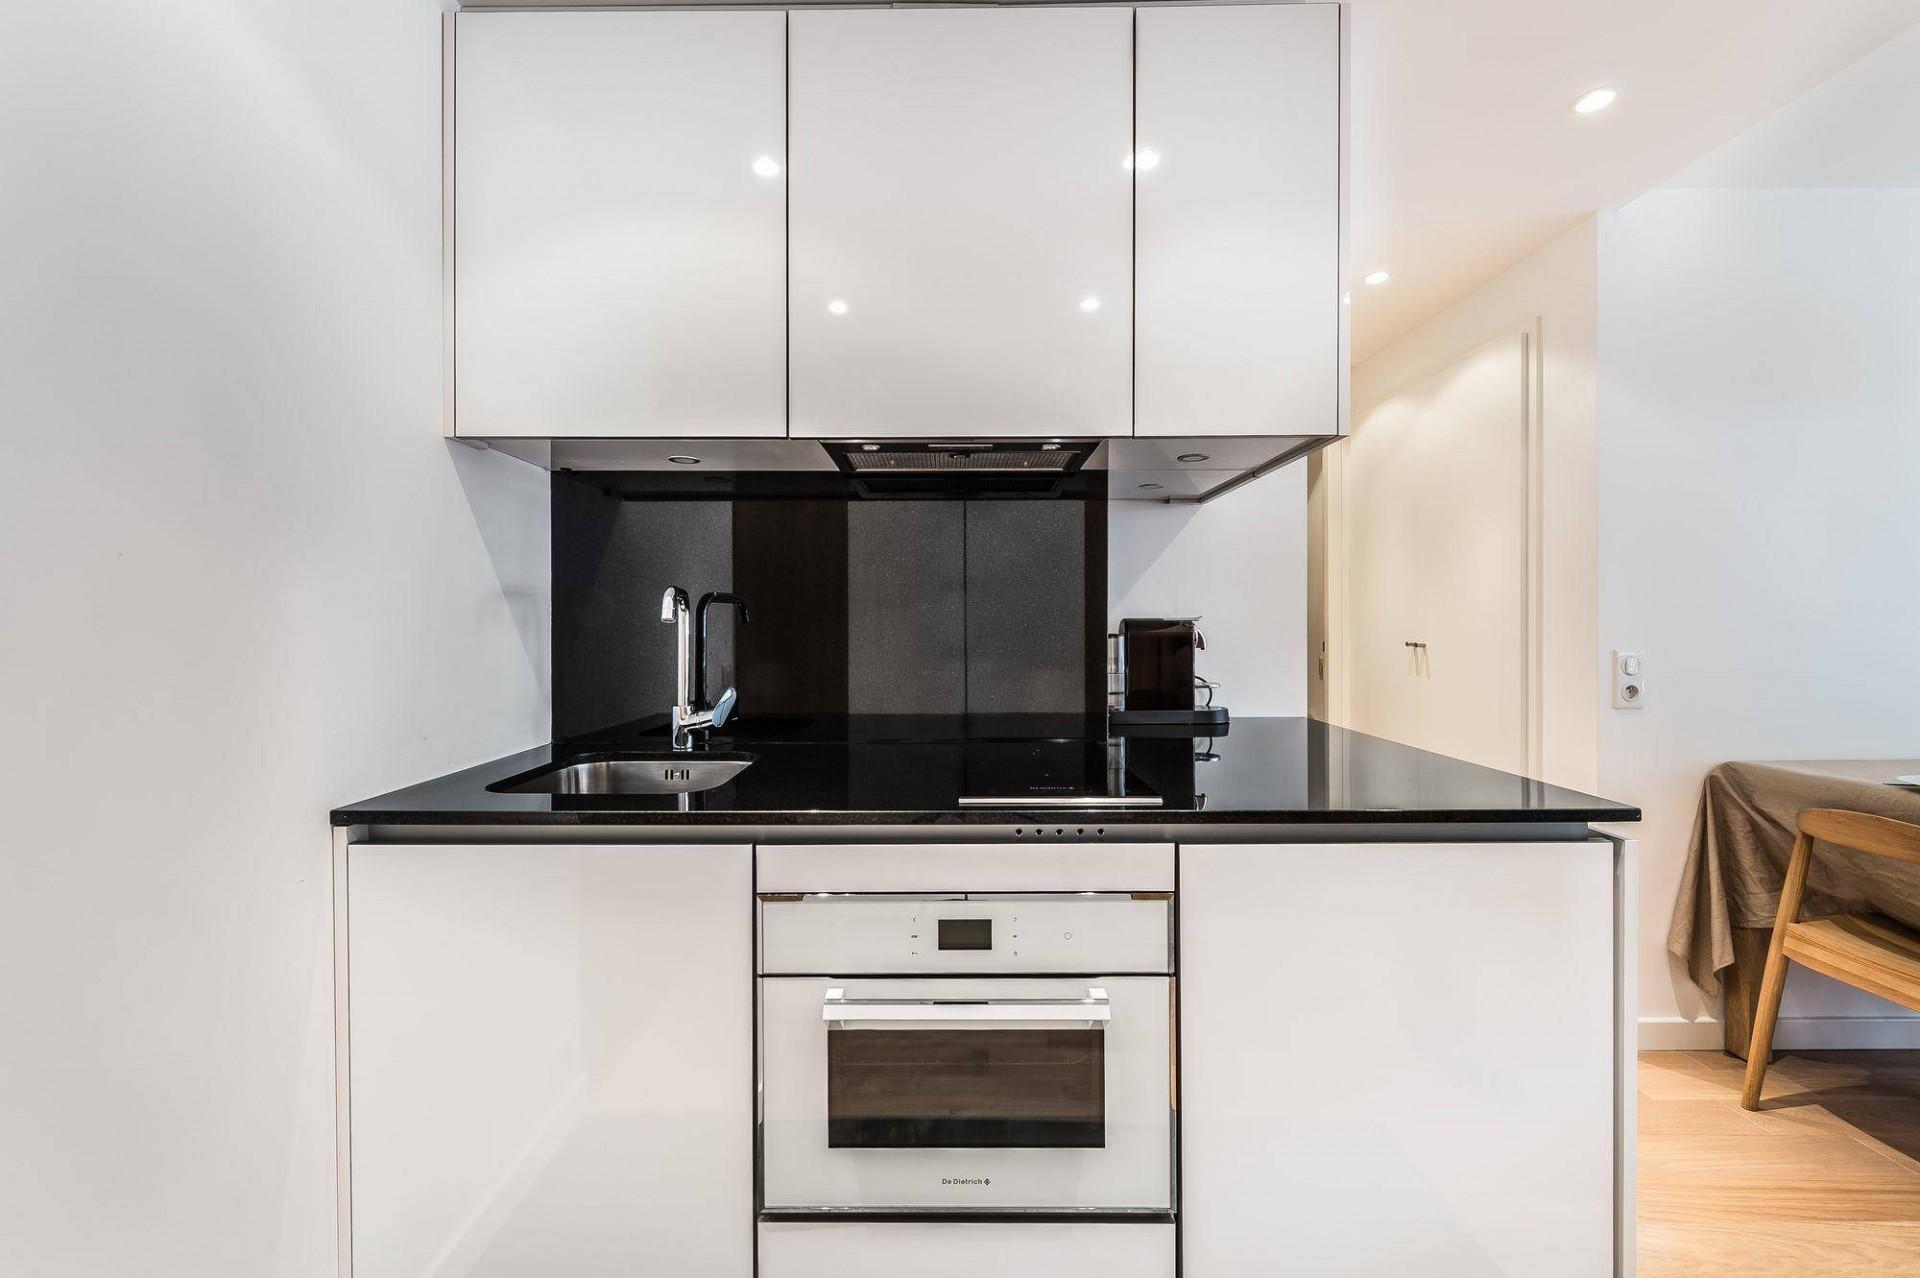 Val d'Isère Luxury Rental Appartment Eclaite Kitchen 2